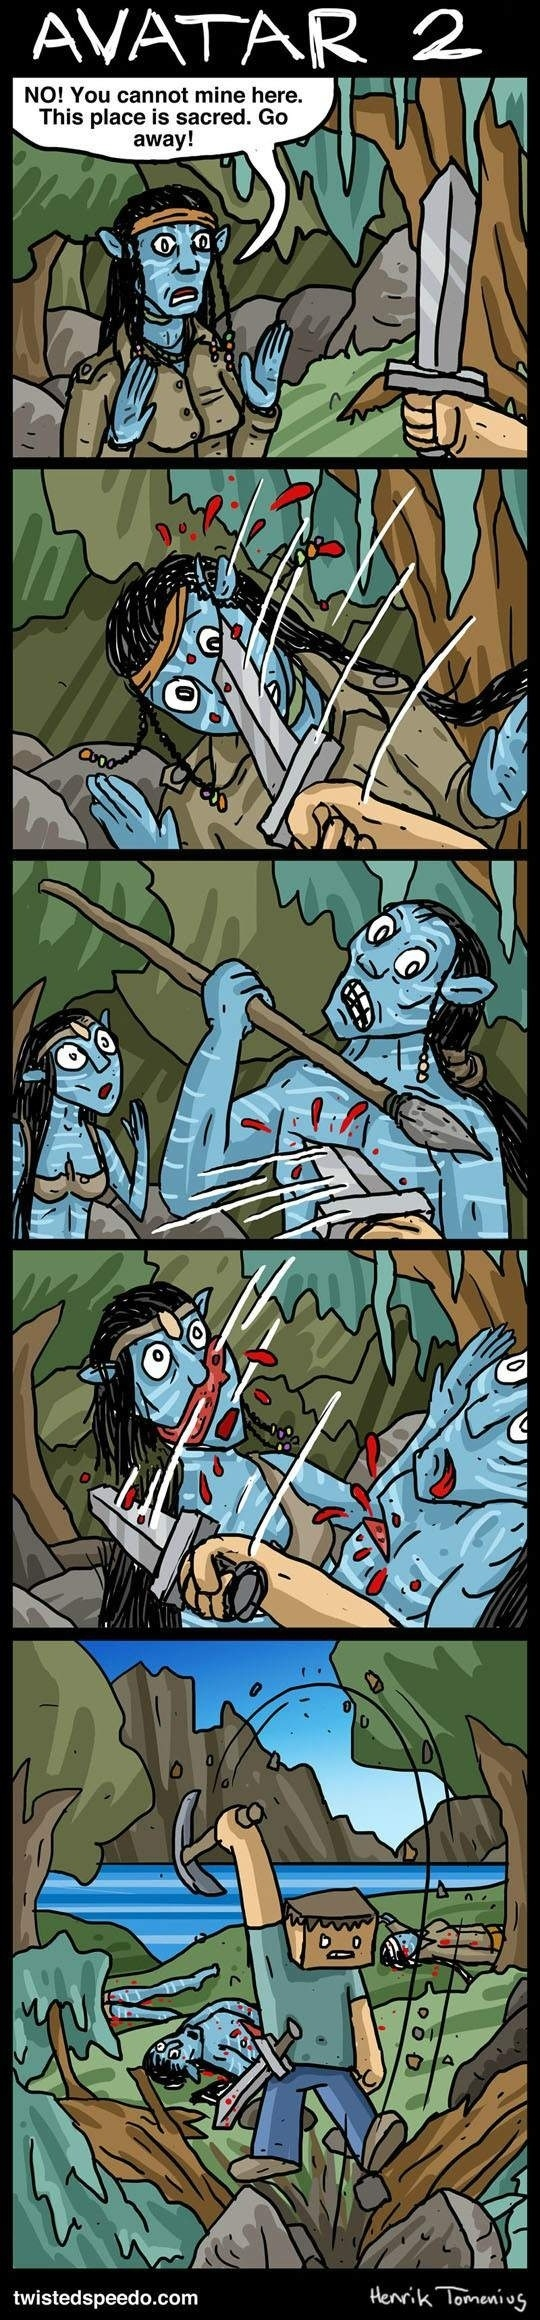 Avatar 2 Humor